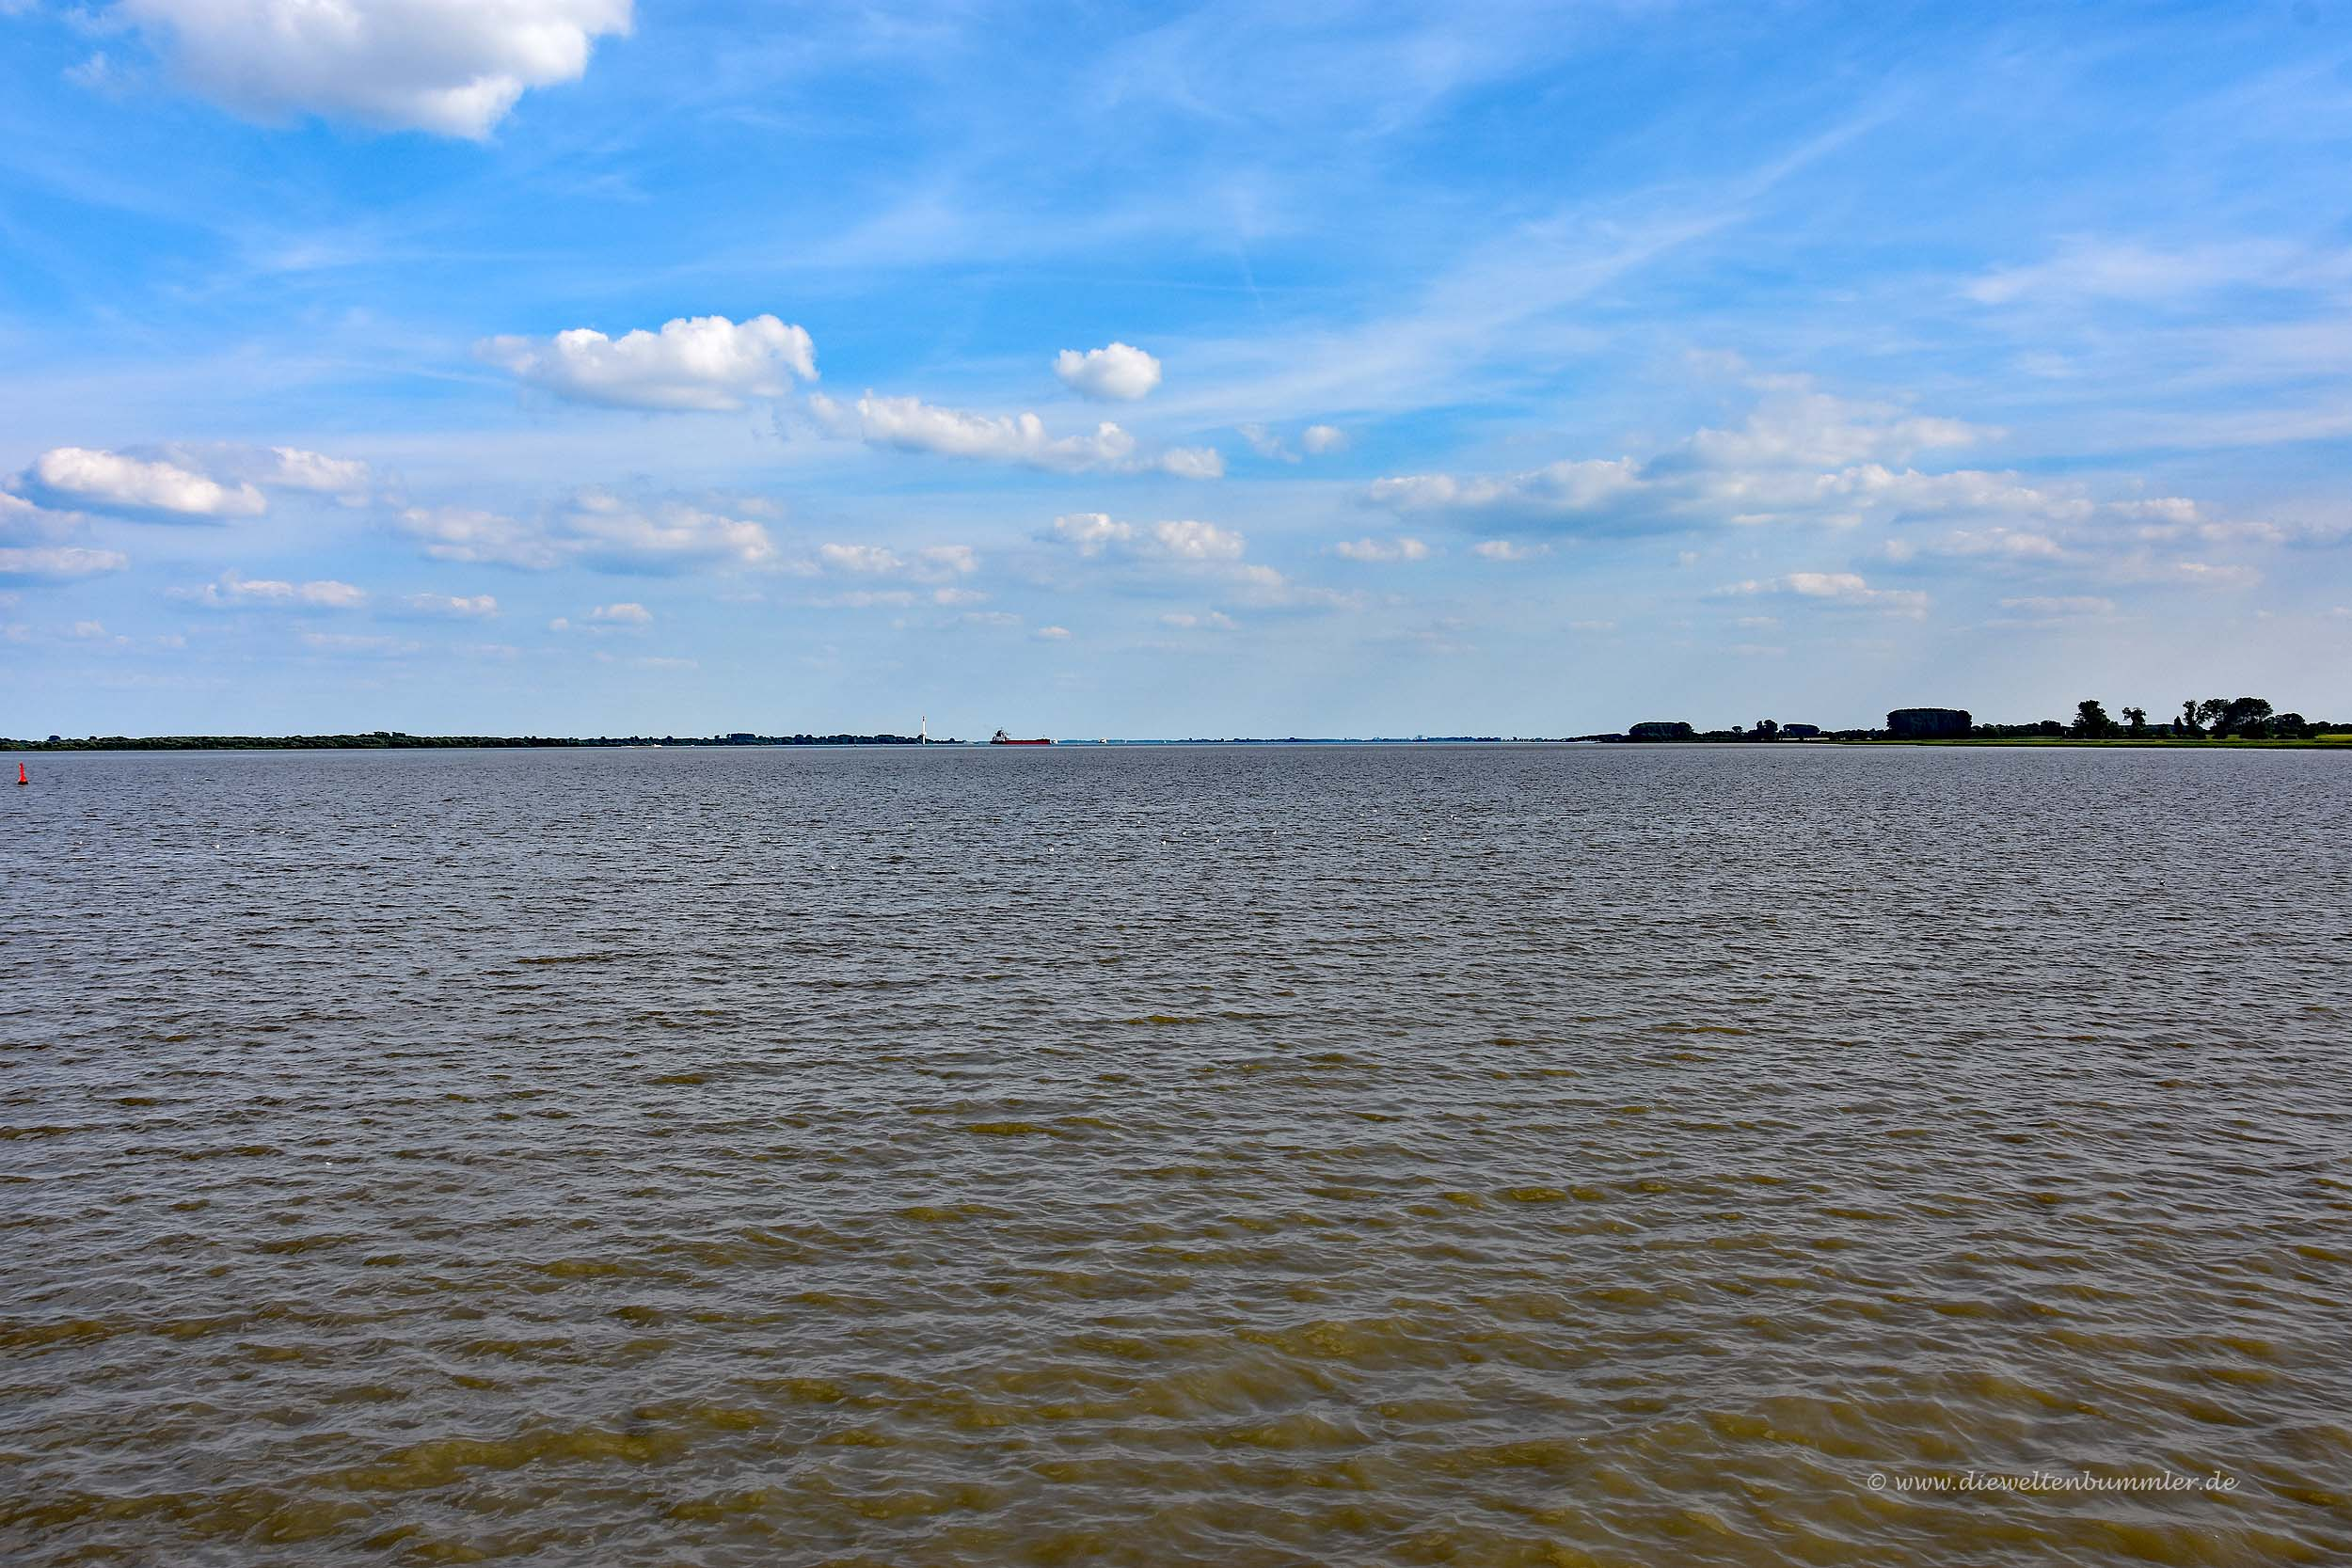 Breite Elbe